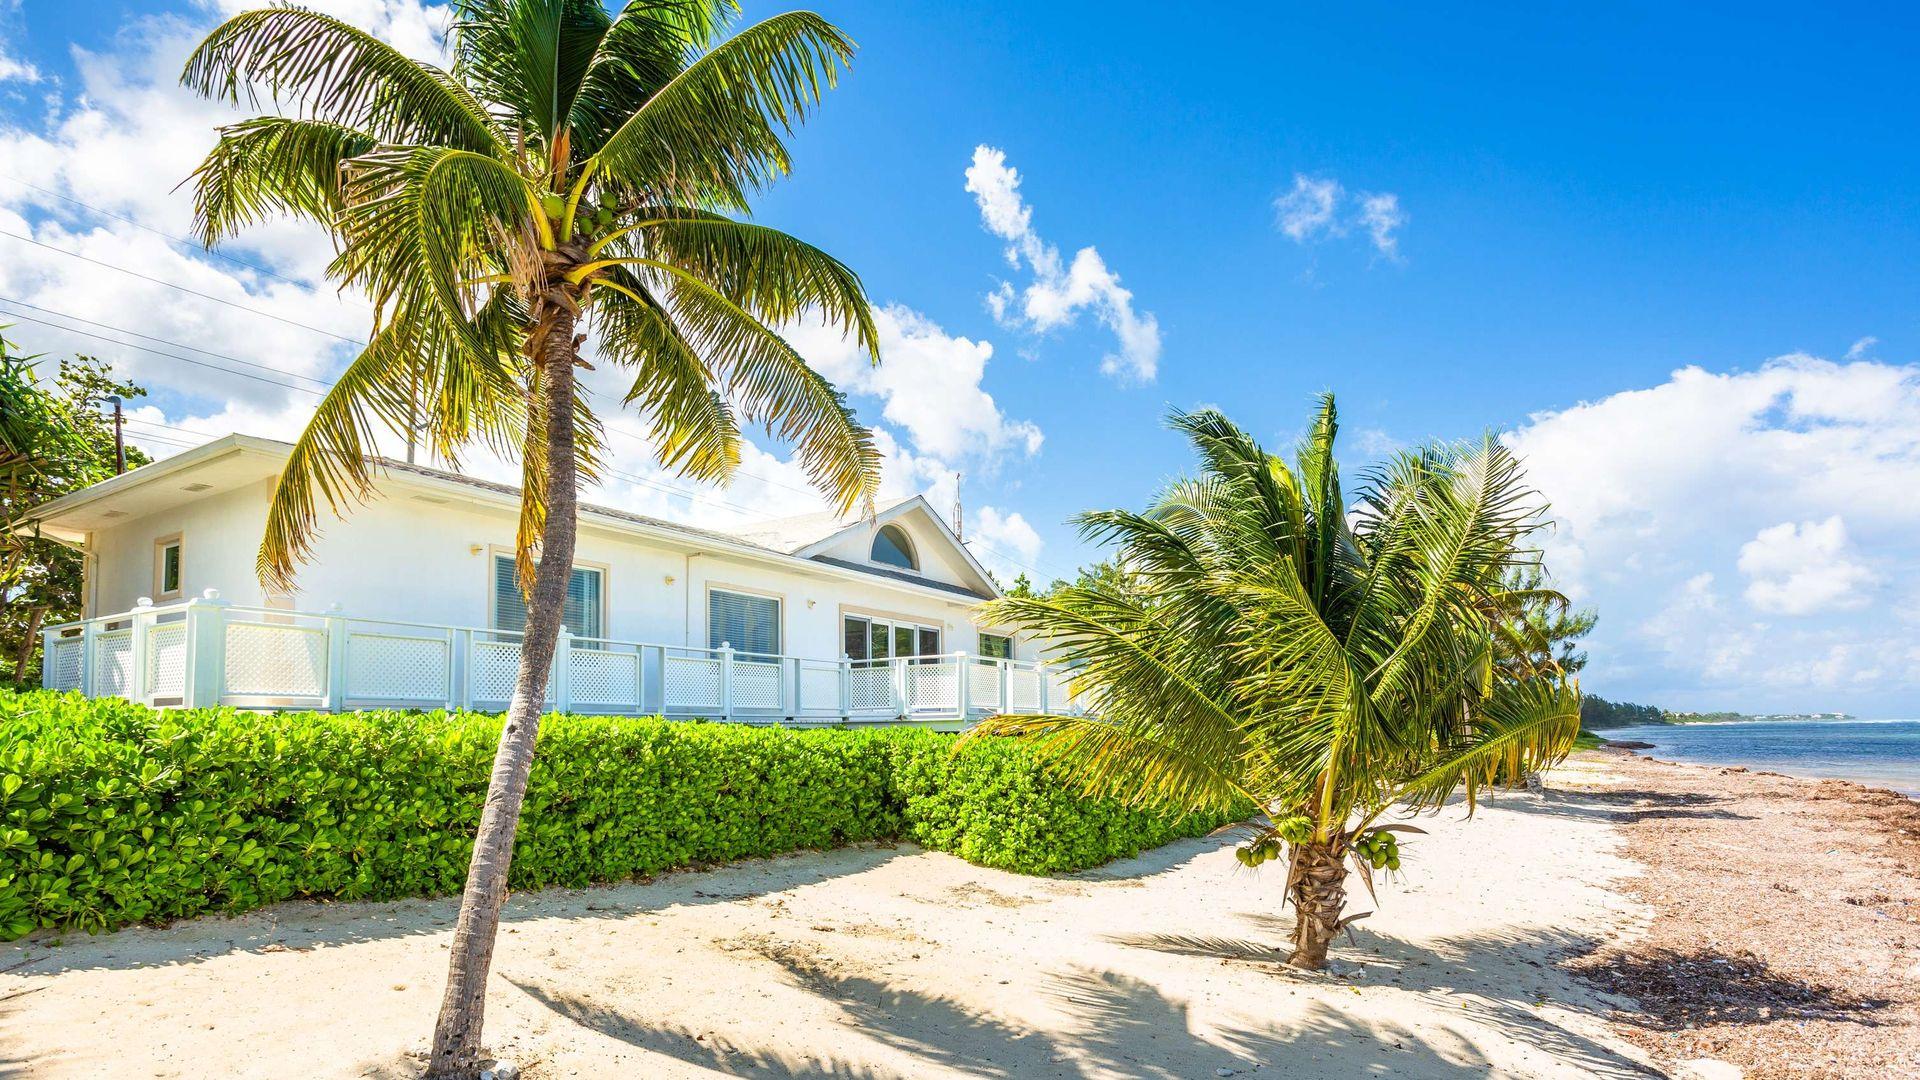 Rum Point Beachfront Home